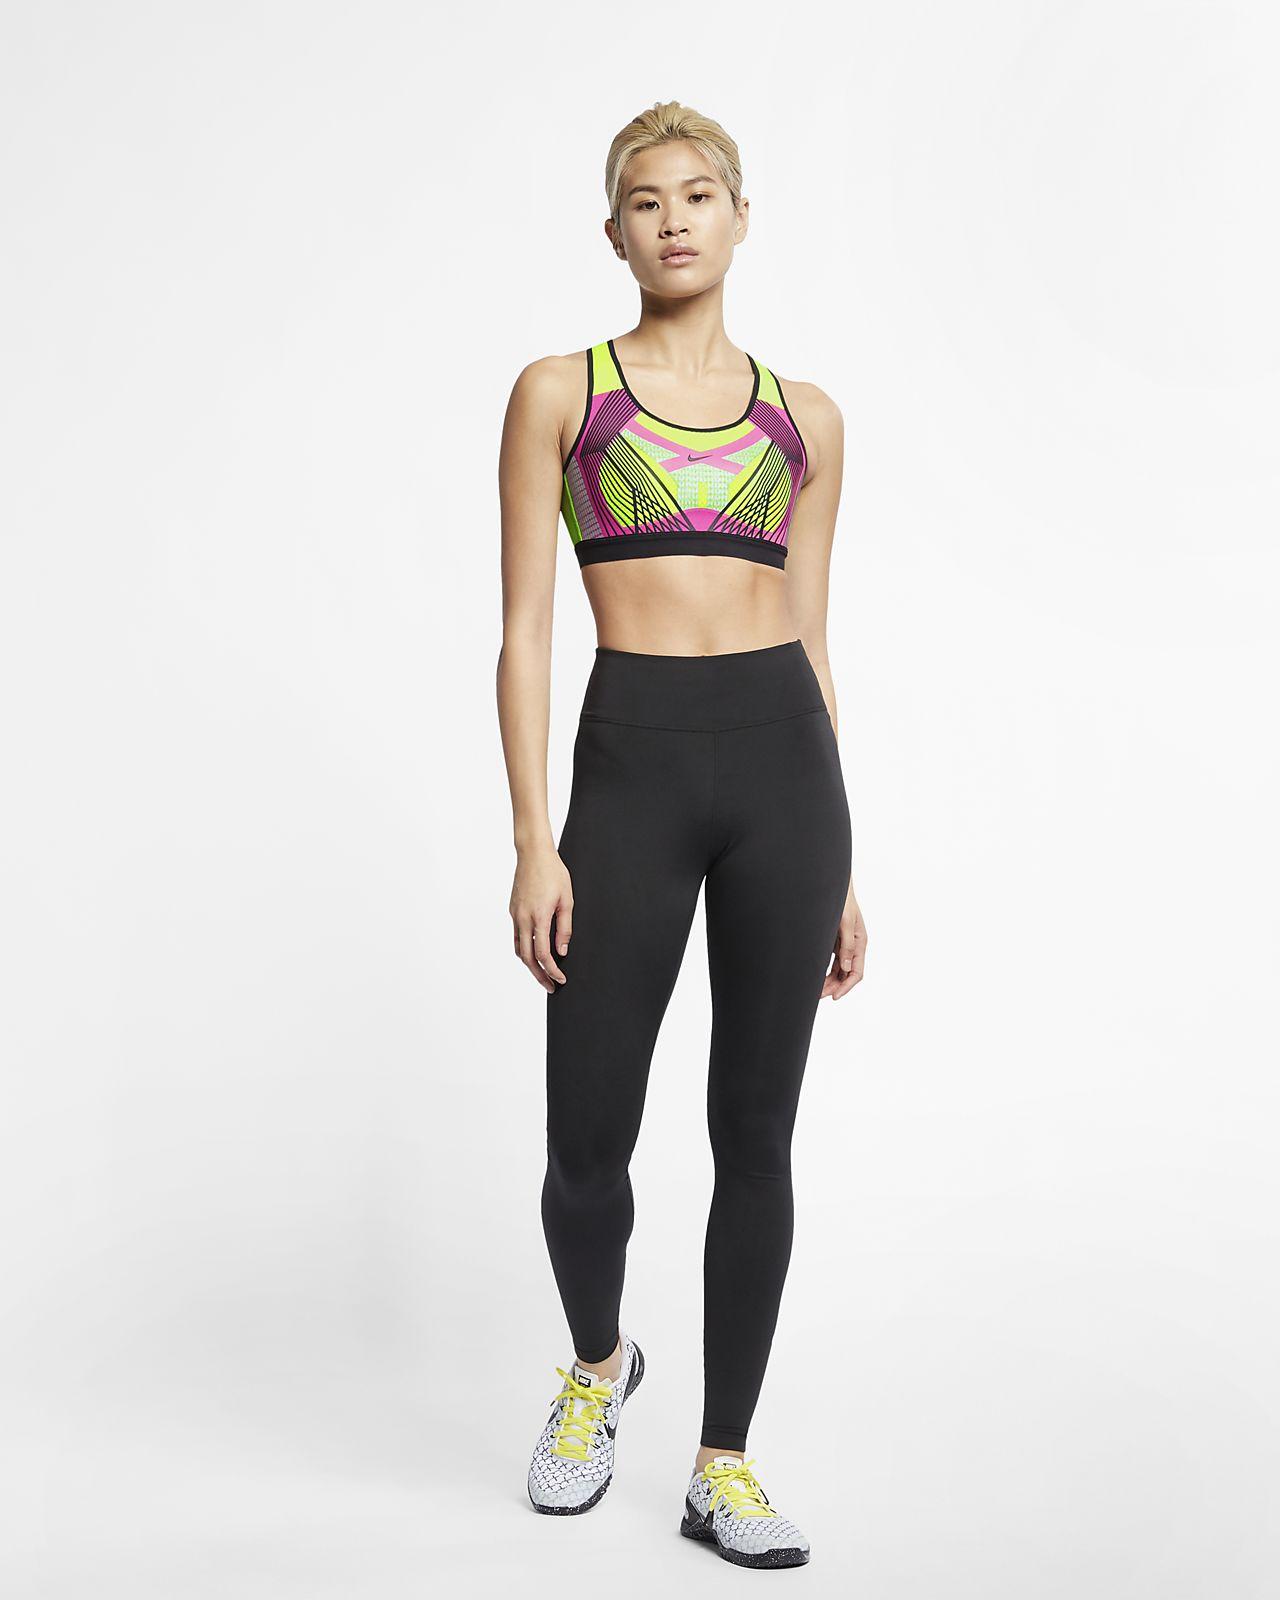 2c490eac2ae10 Nike Classic Women s Medium Support Sports Bra. Nike.com ZA